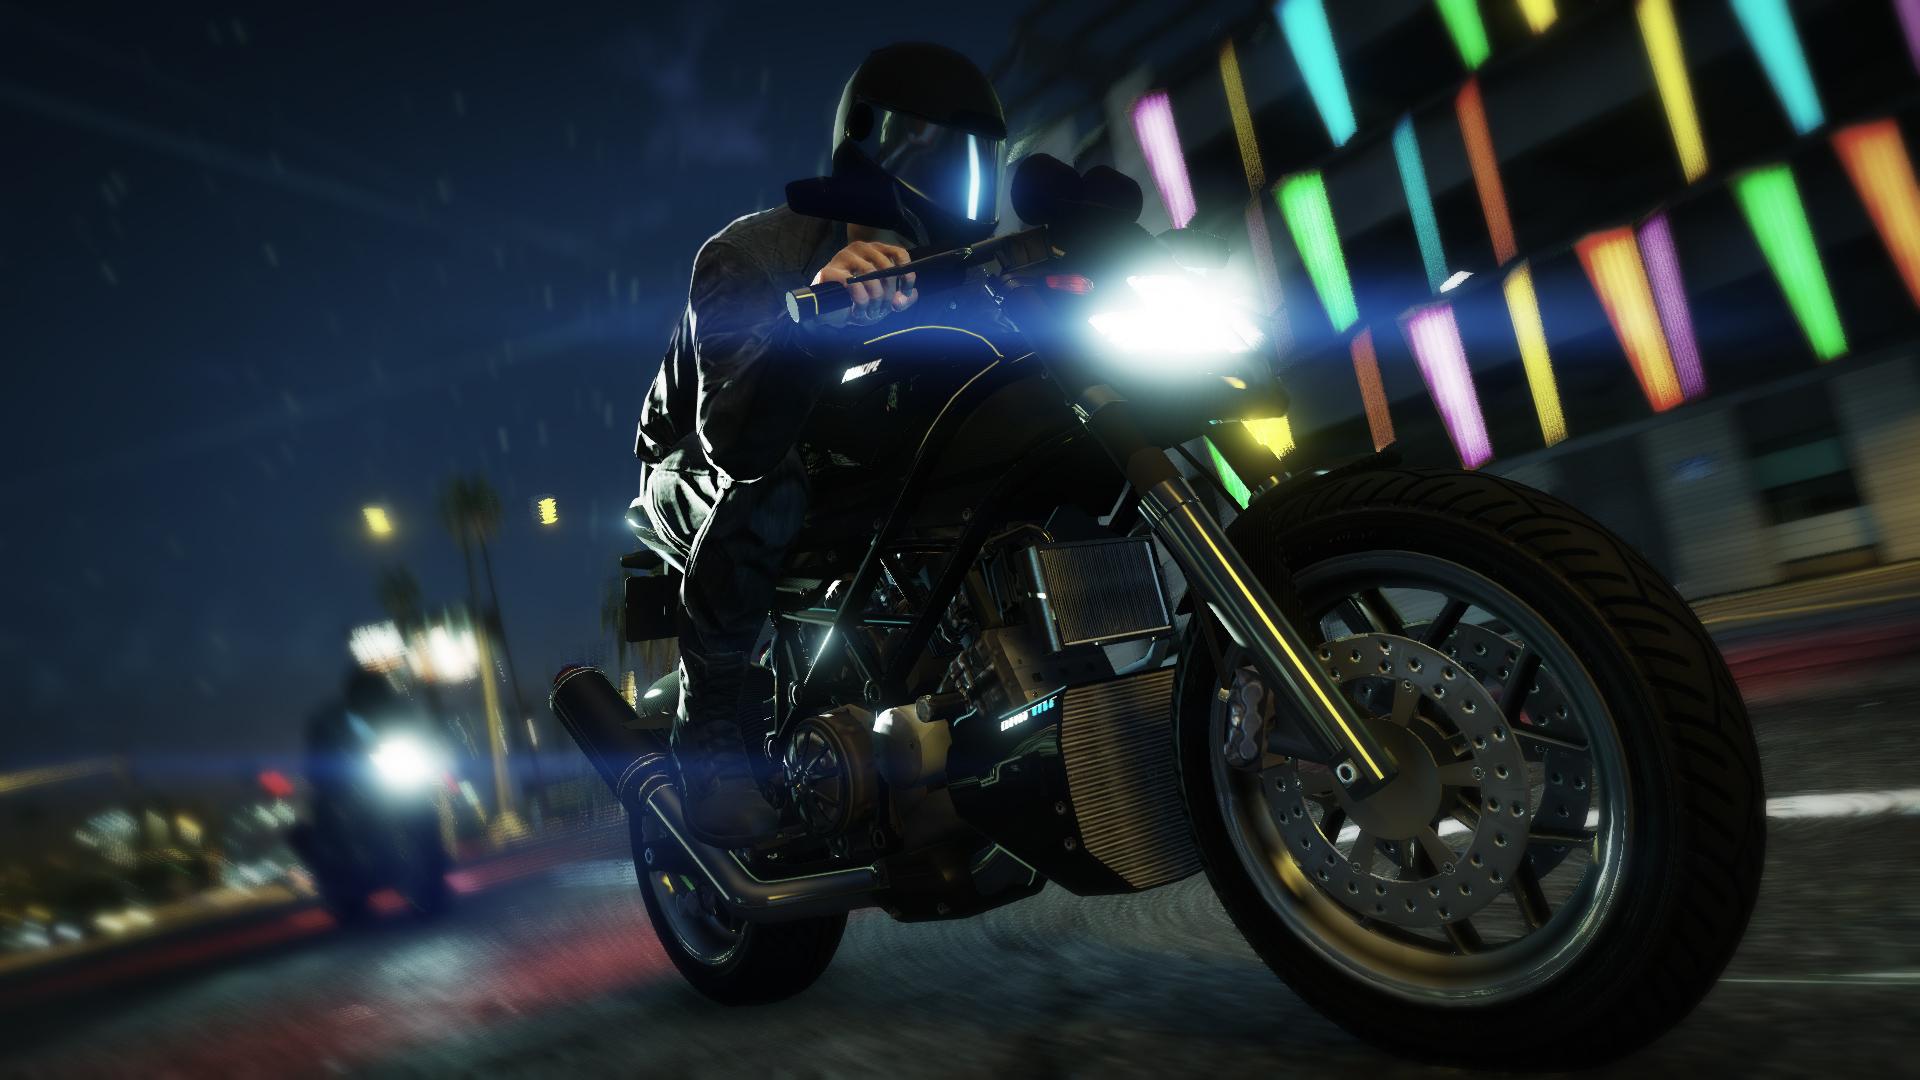 Grand Theft Auto V Full HD Fond d'écran and Arrière-Plan   1920x1080   ID:581971